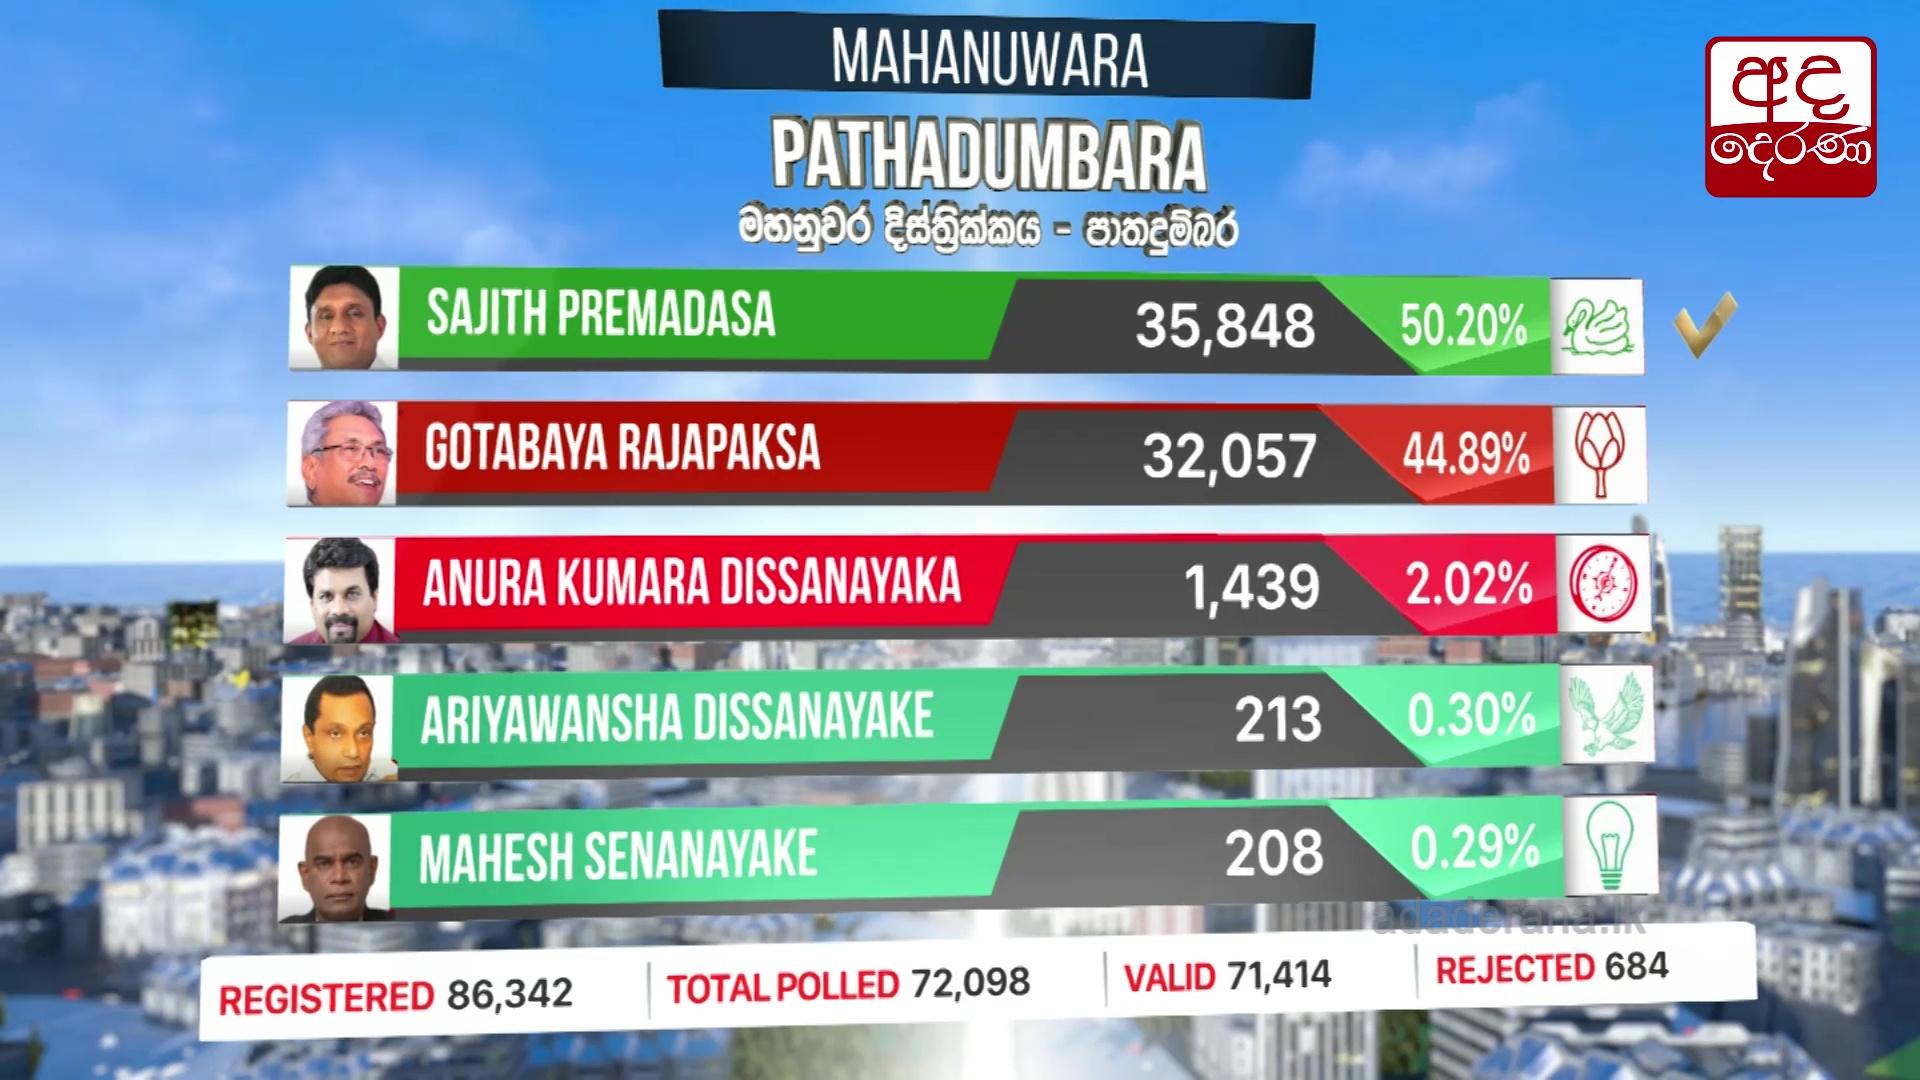 Presidential Election 2019: Pathadumbara division results